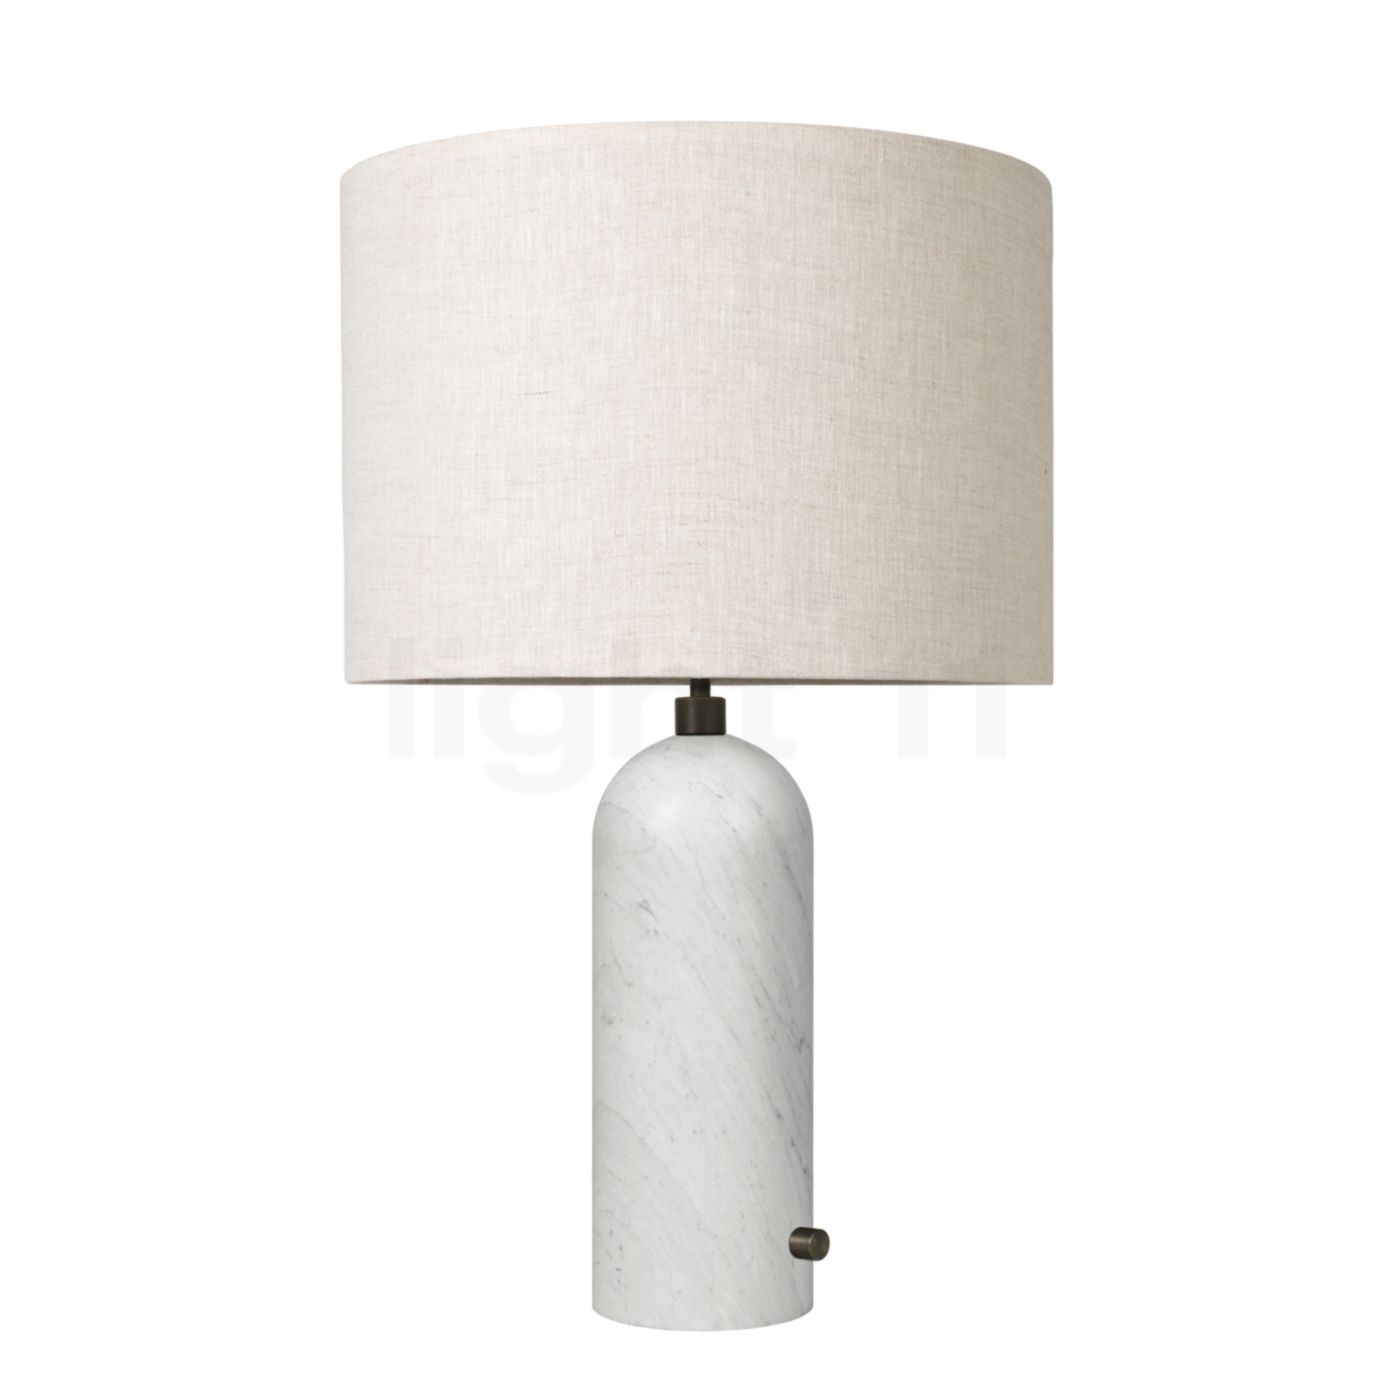 Buy Gubi Gravity Table Lamp Large At Light11 Eu